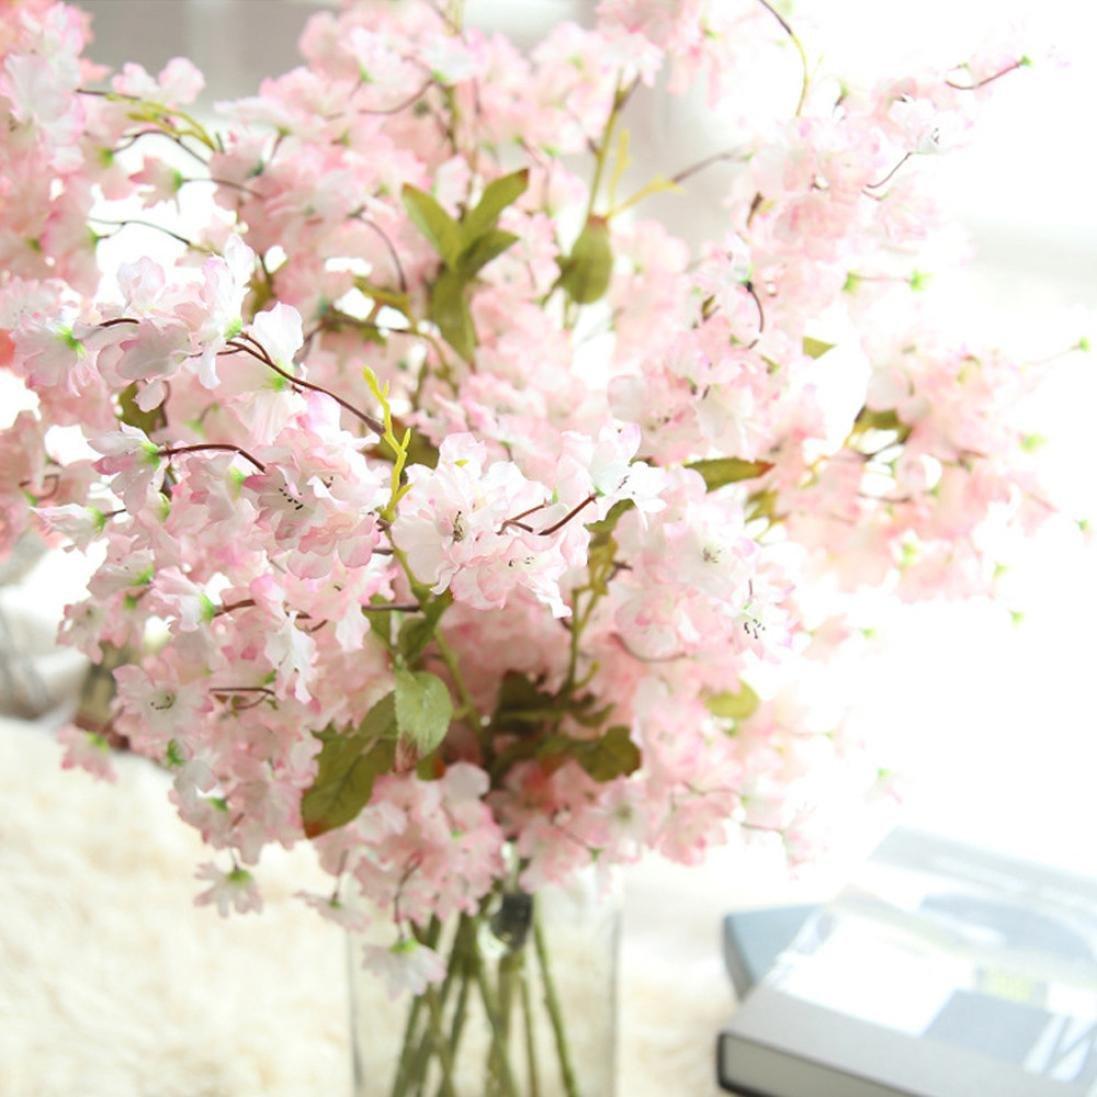 Amazon.com: Artificial Silk Cherry Blossom Fake Flowers , Cywulin ...